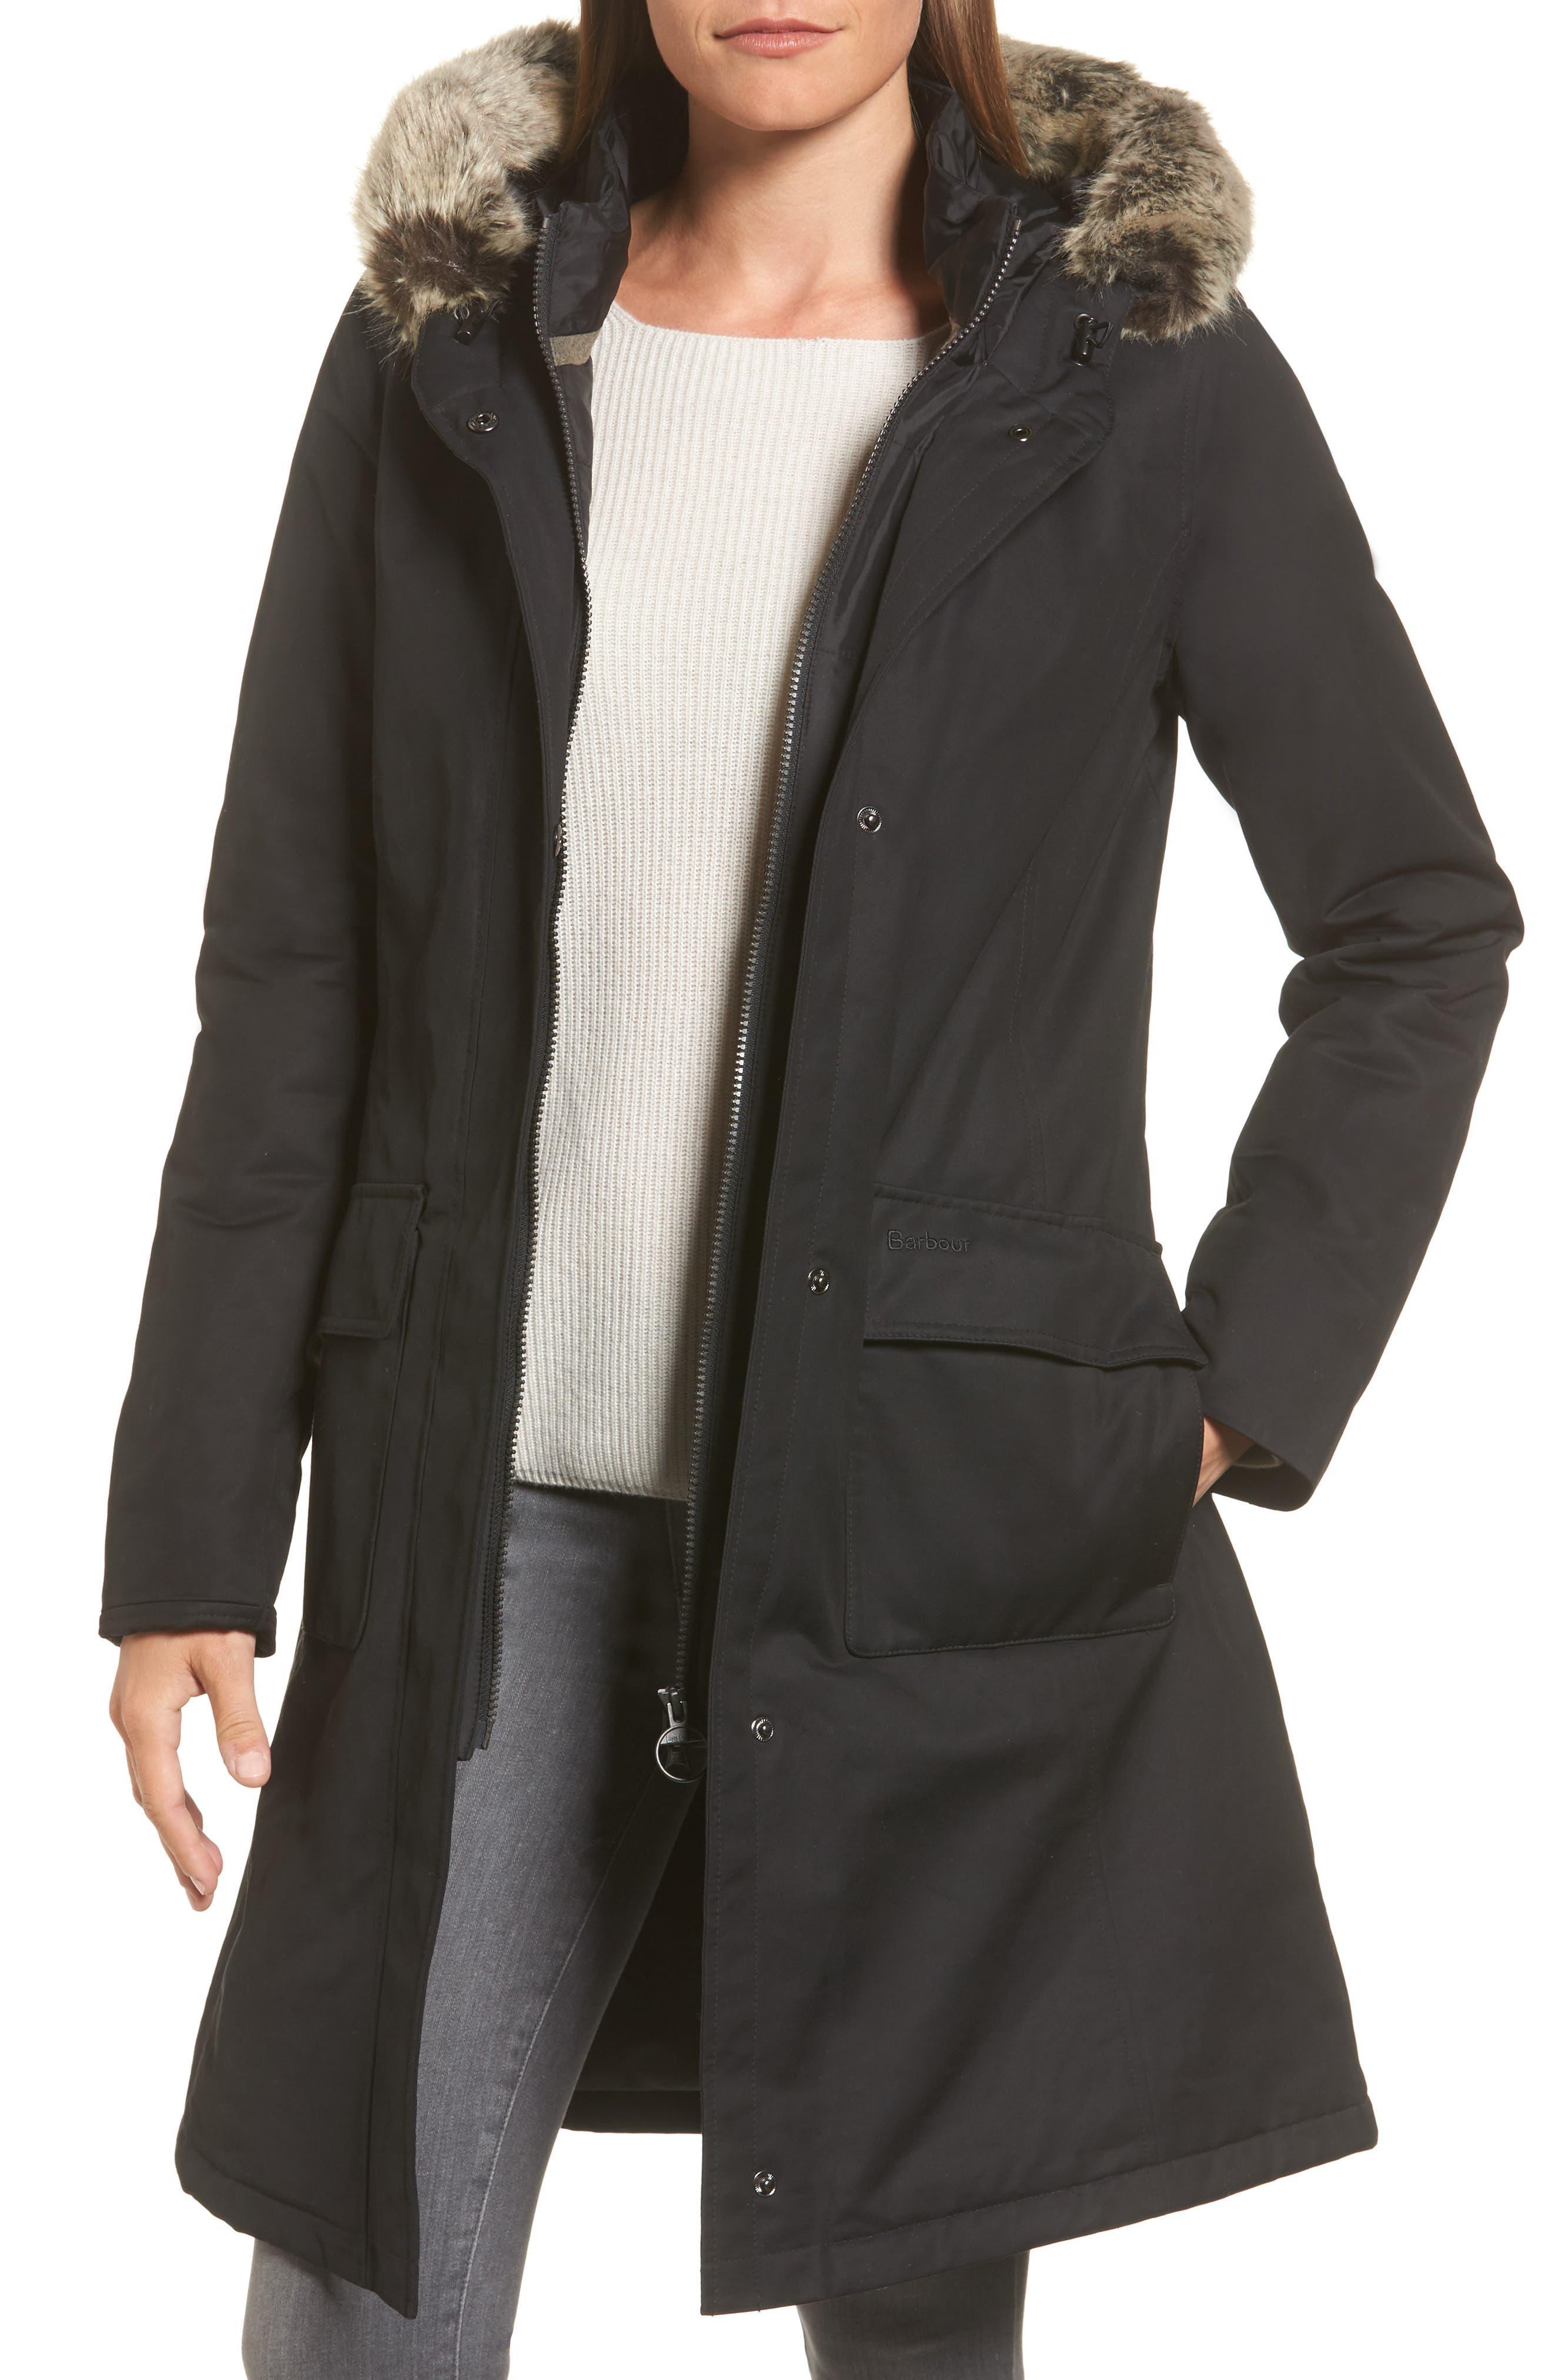 Barbour Linton Hooded Waterproof Jacket with Faux Fur Trim